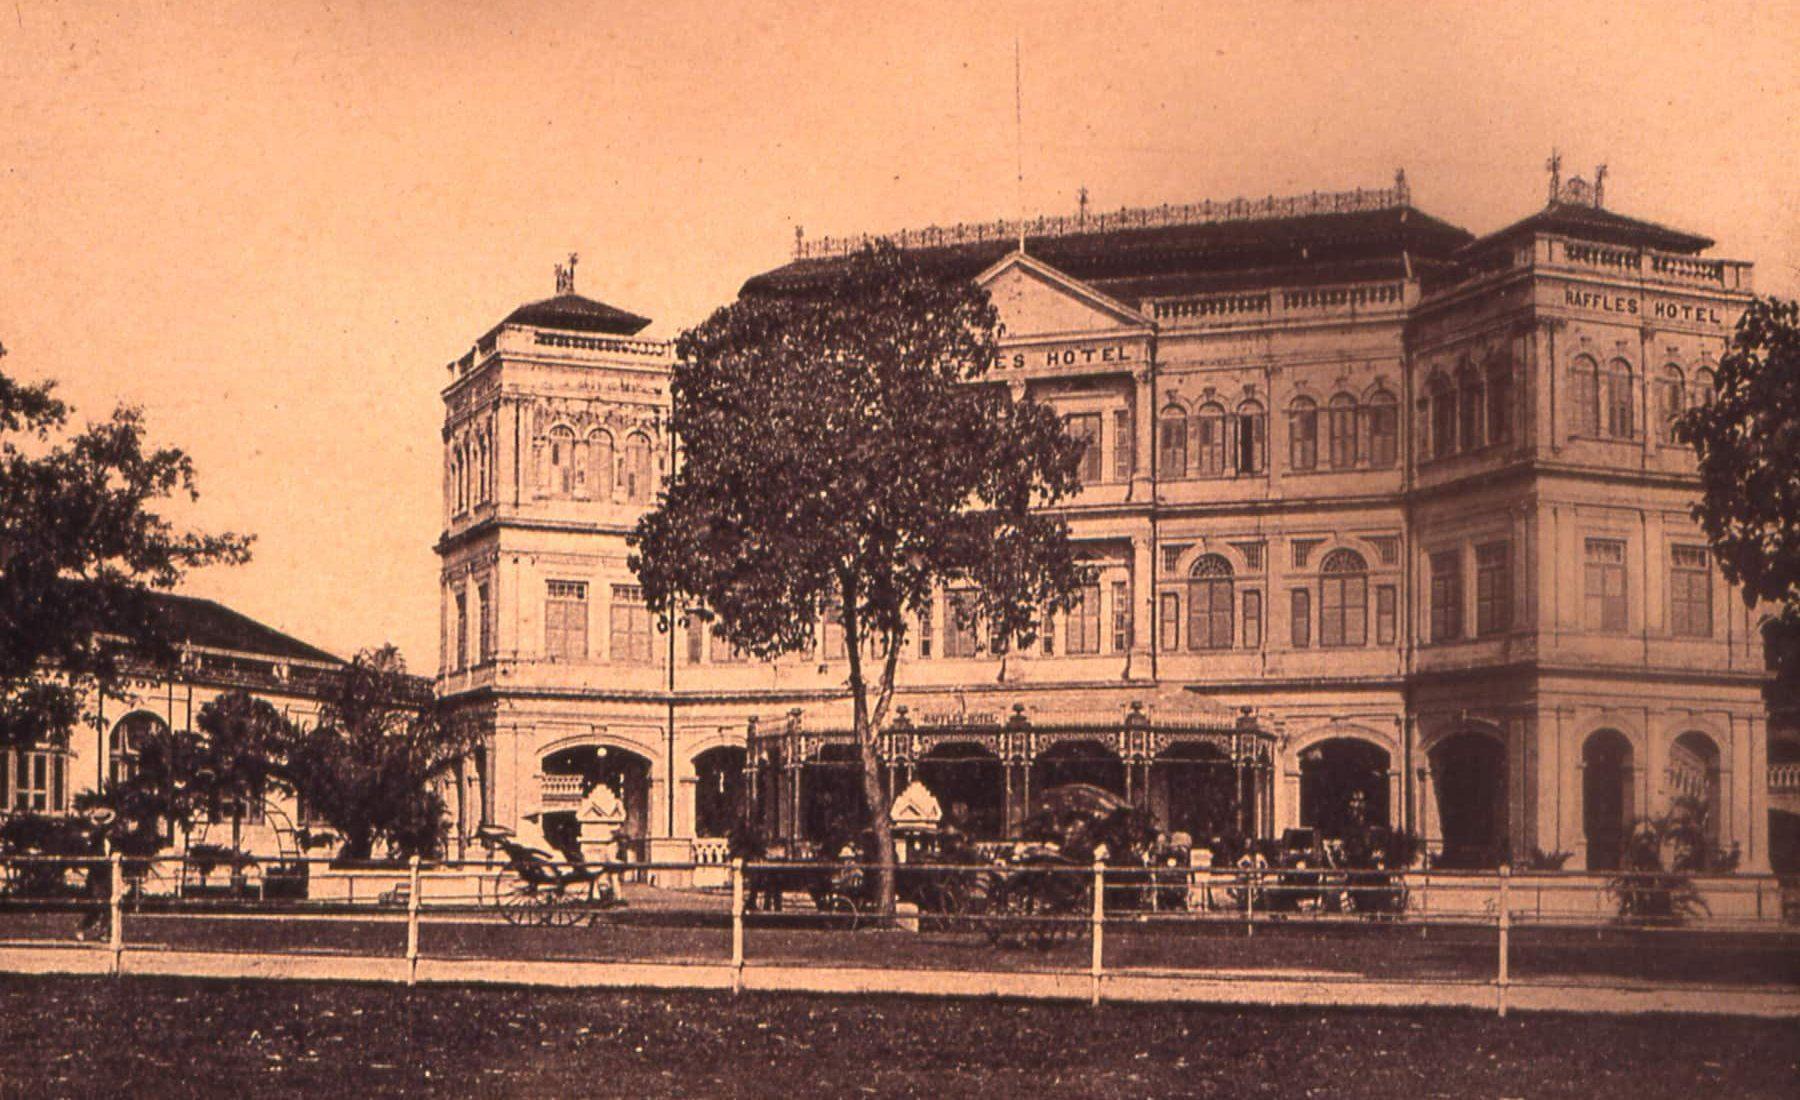 Raffles Singapore  - Early Modes of Transportation